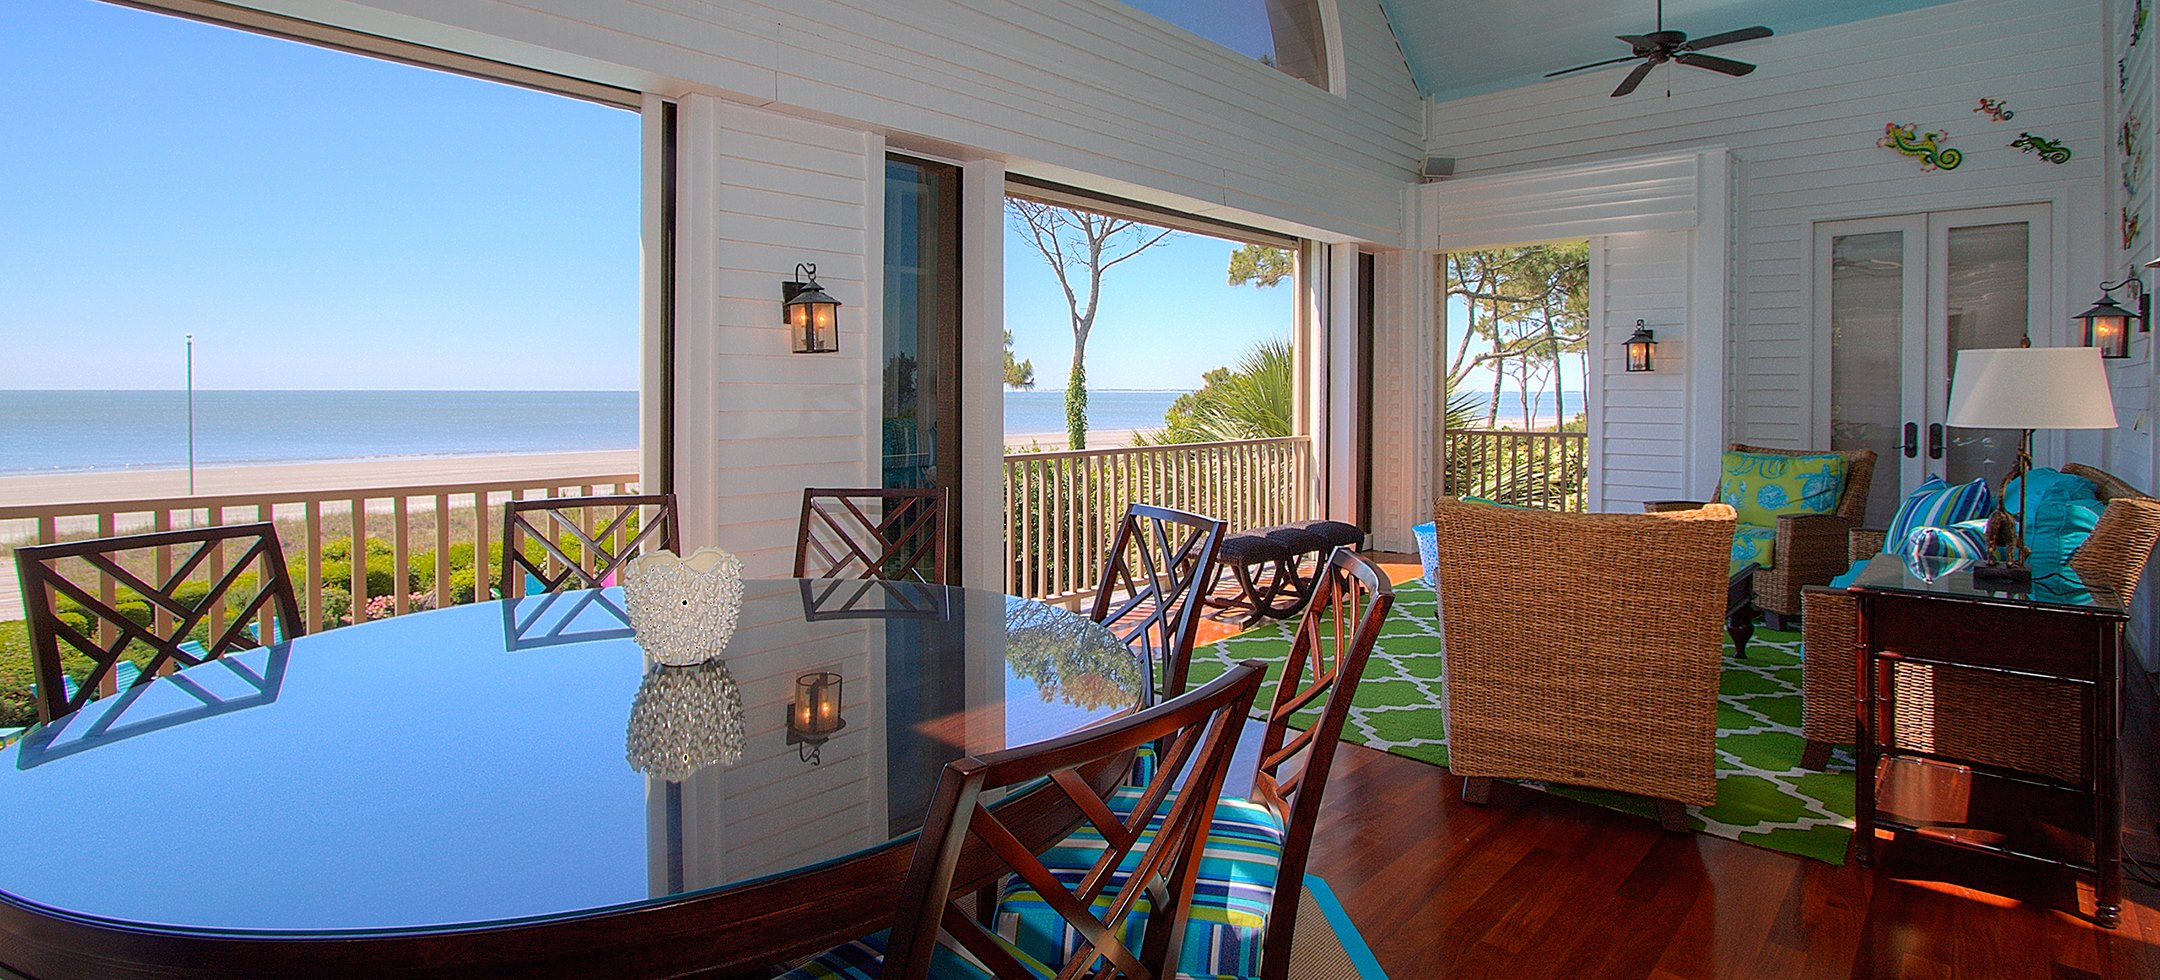 Destination Vacation Hilton Head Island Vacation Rental Home